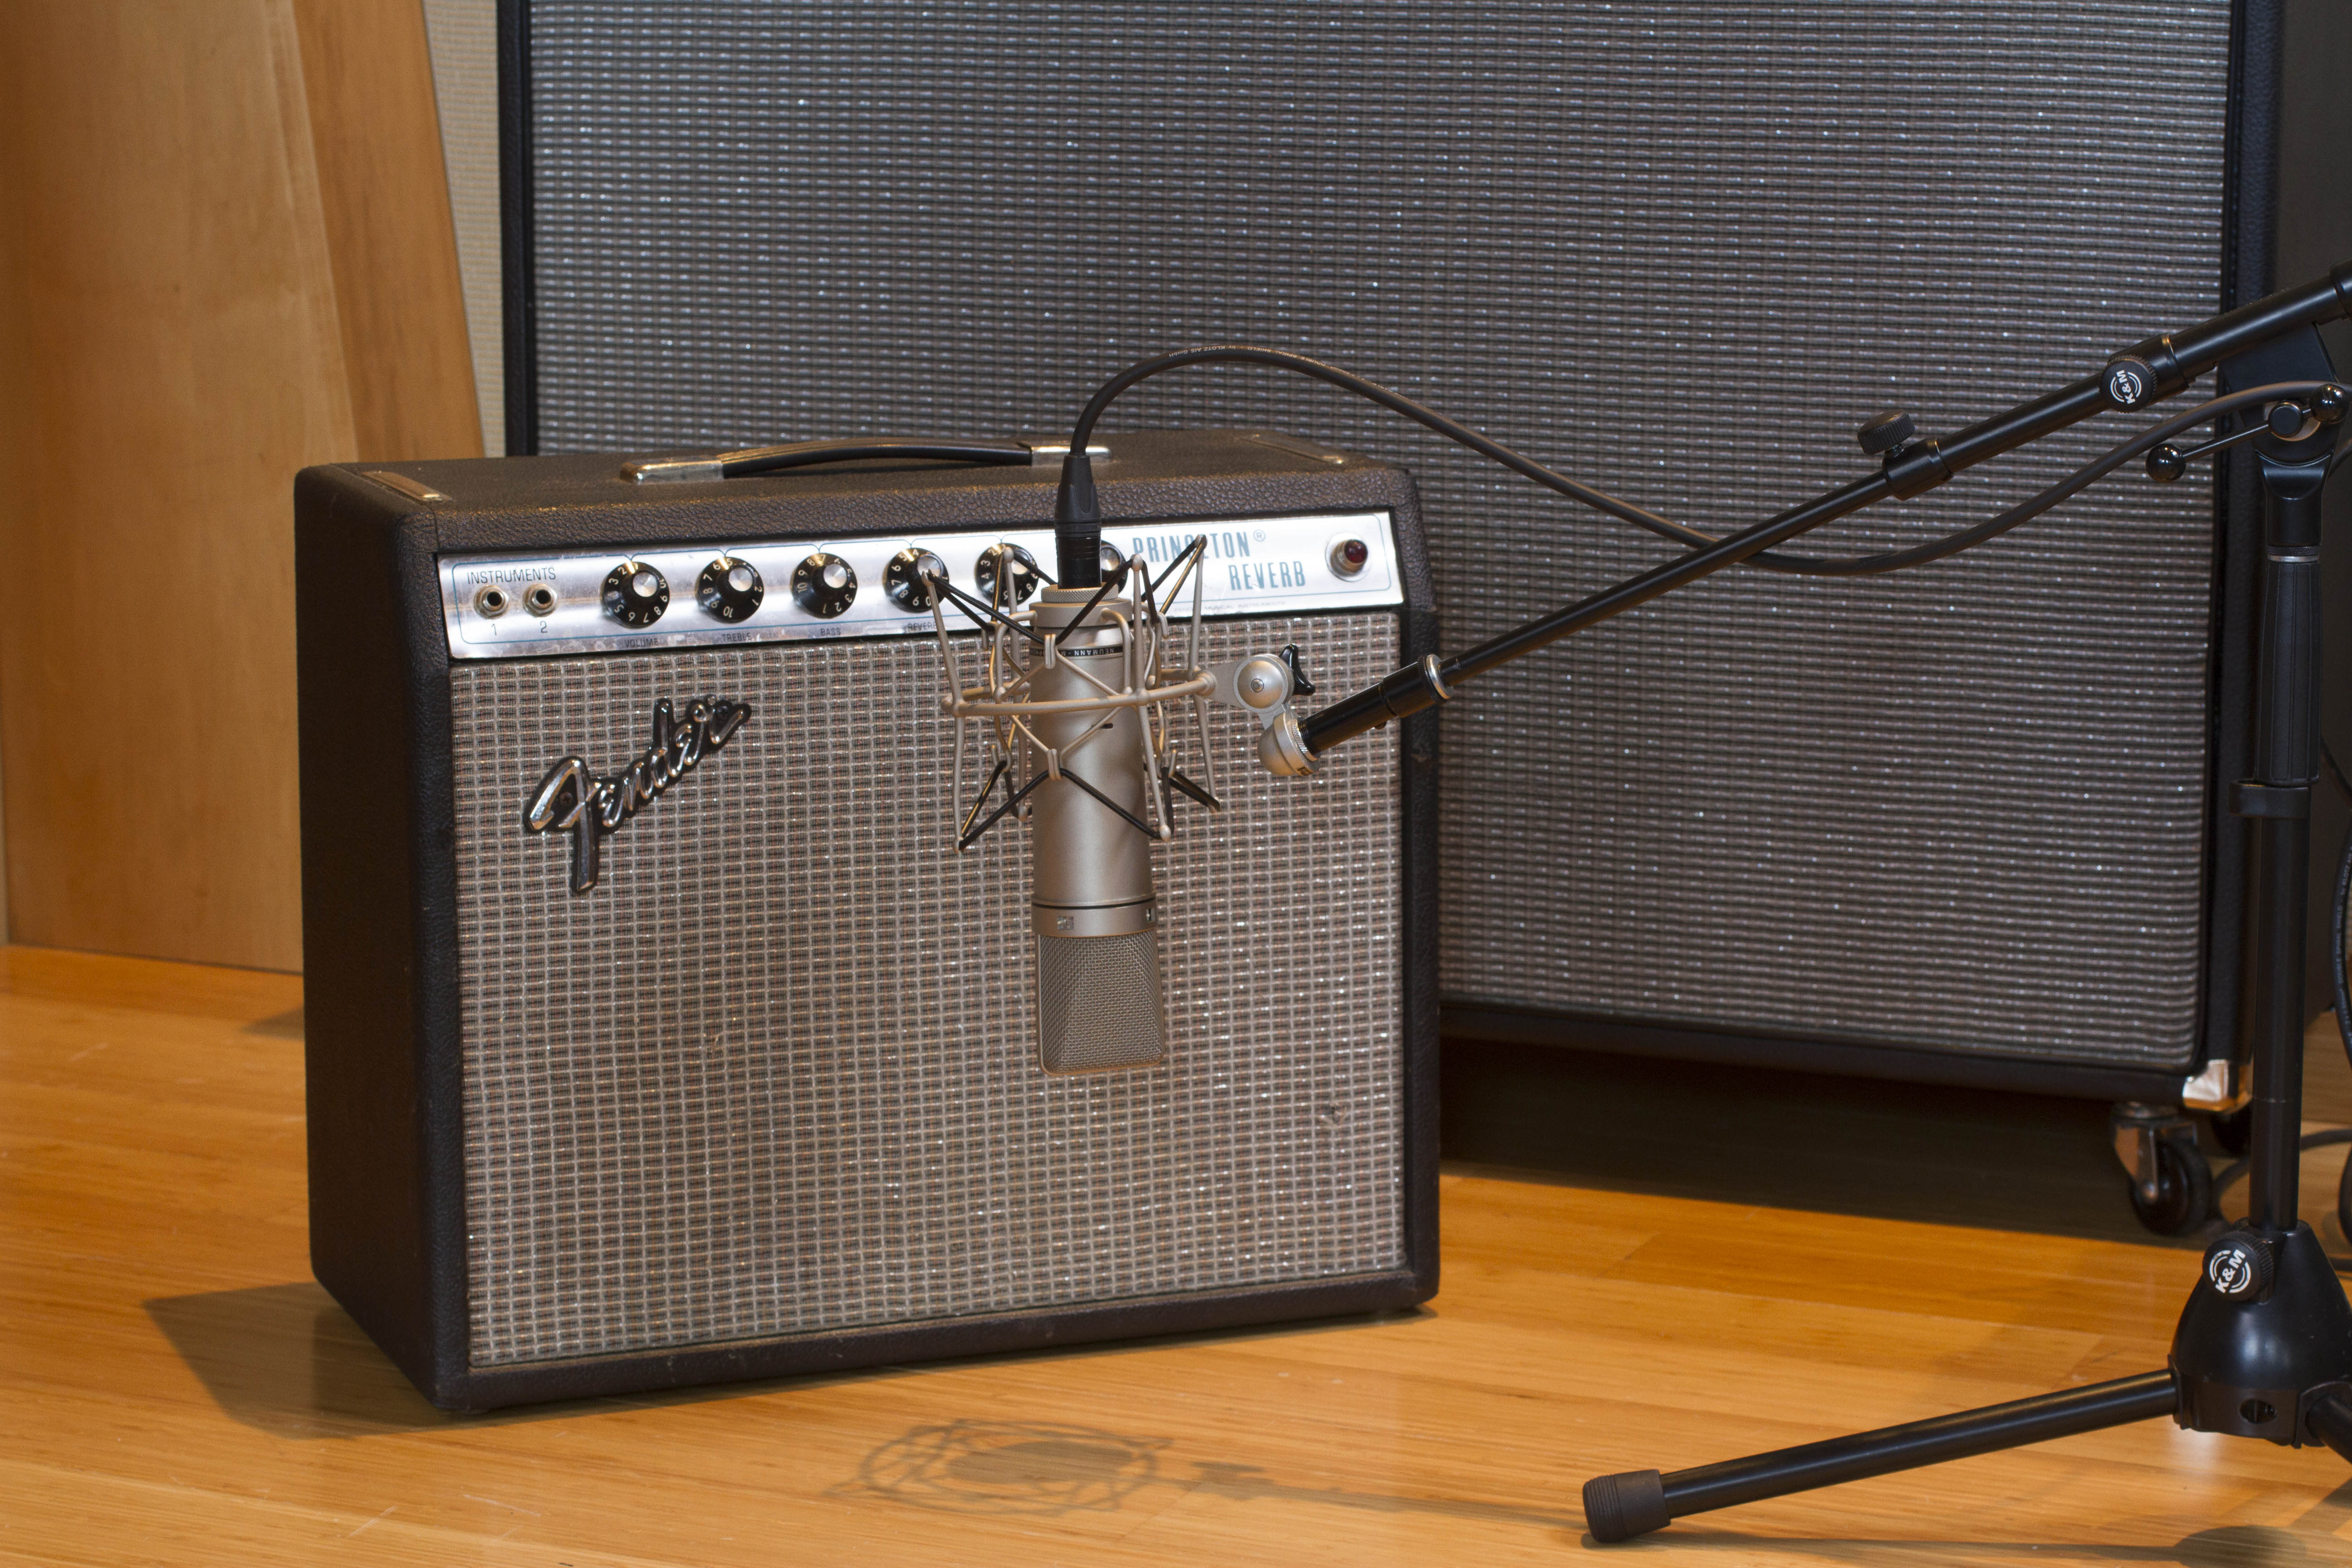 Feature Recording Guitar With Ken Scott Sweetwater Mic Condenser Amplifier